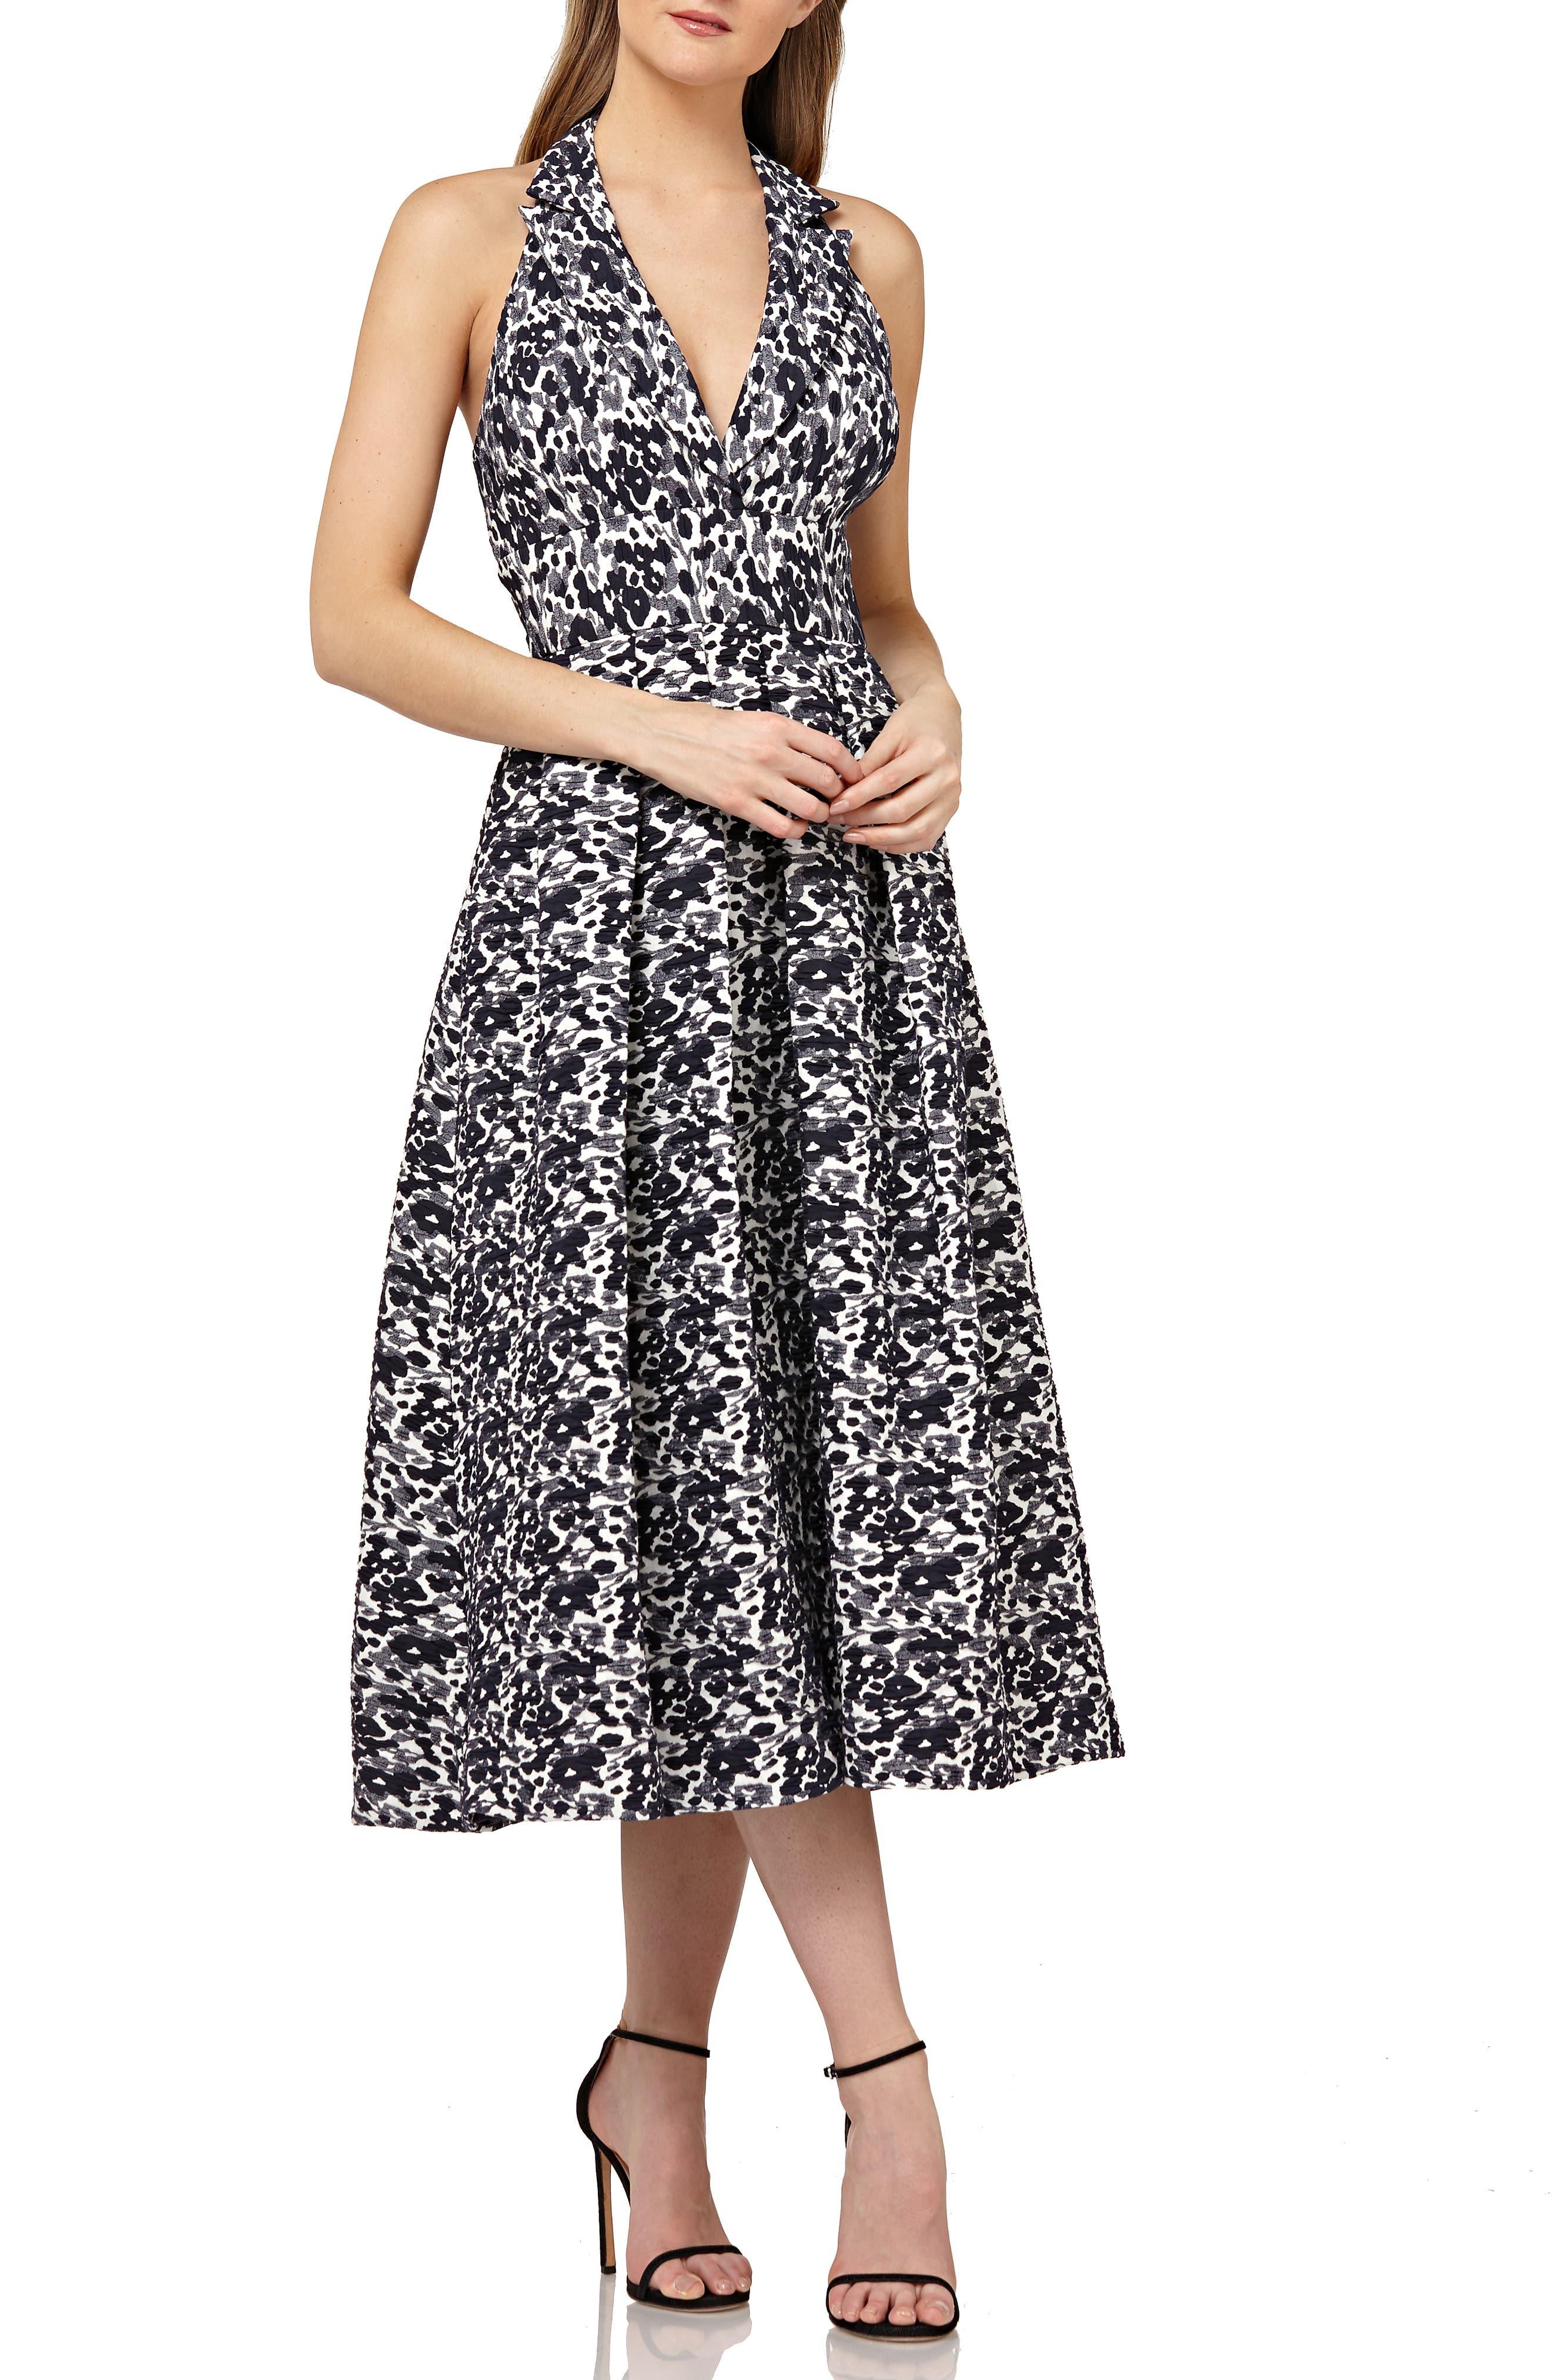 Kay Unger Halter Tea Length Dress